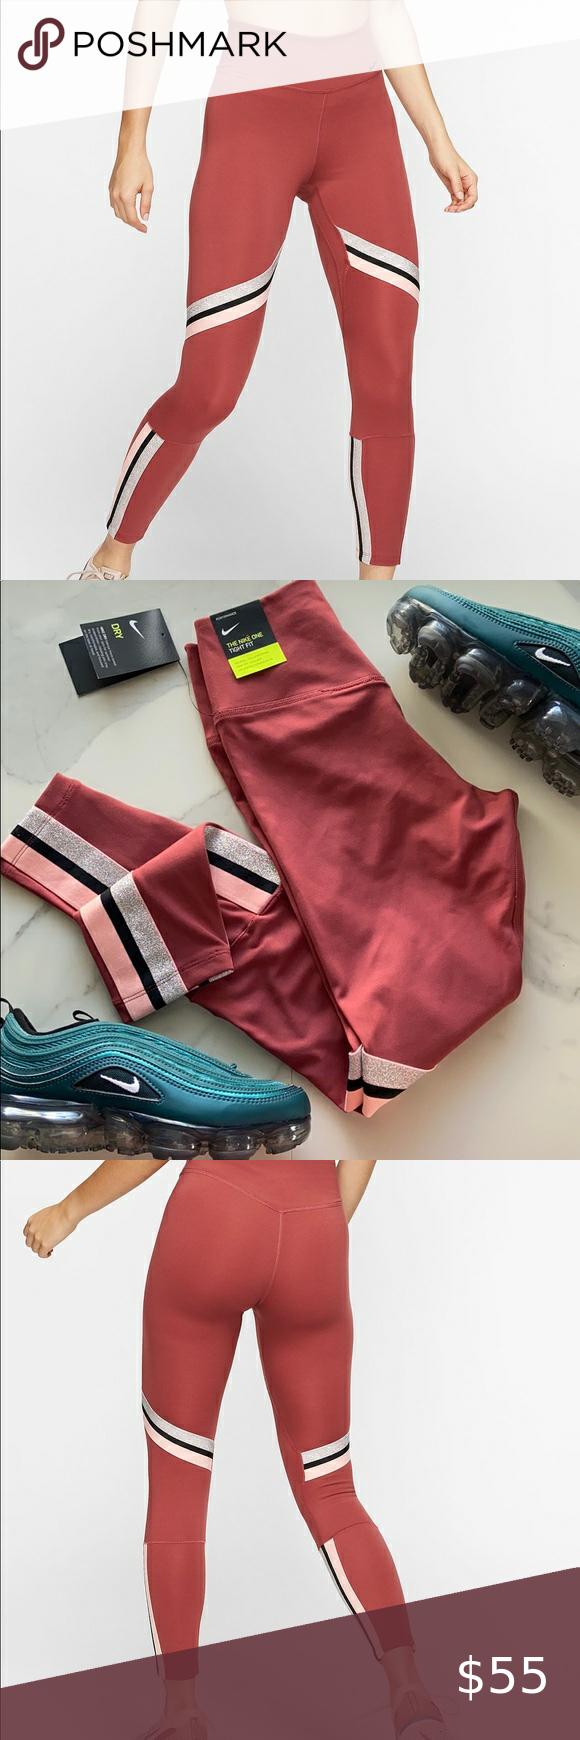 NWT Nike One Icon Clash training tights in 2020 Leggings